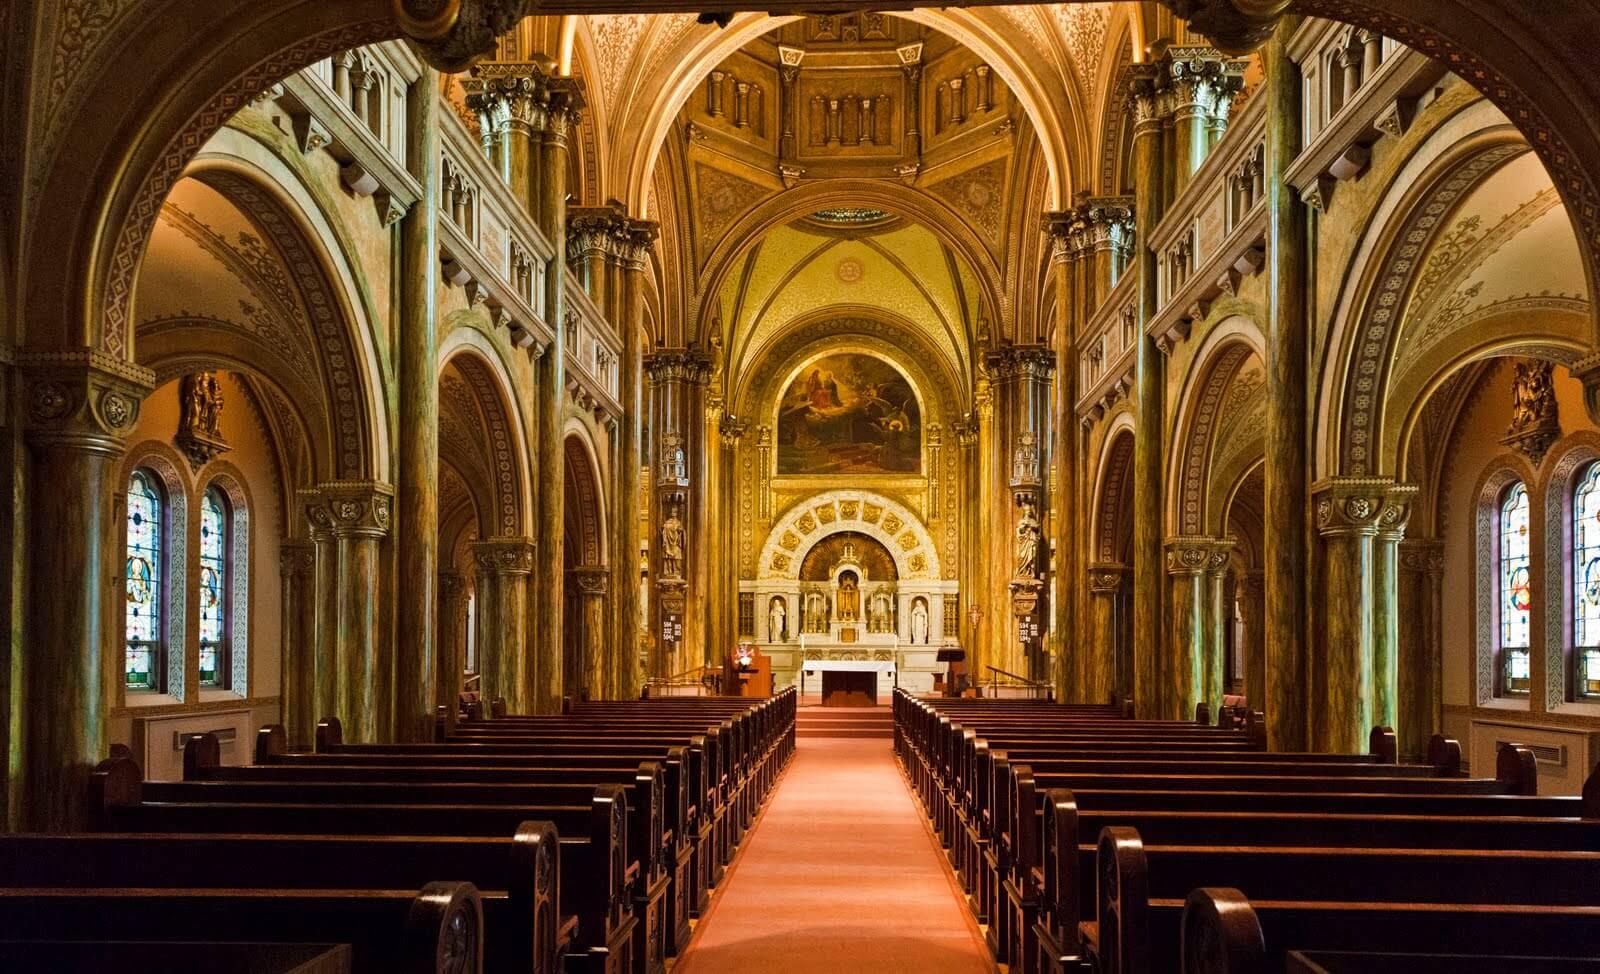 St. Rose Convent - Explore La Crosse